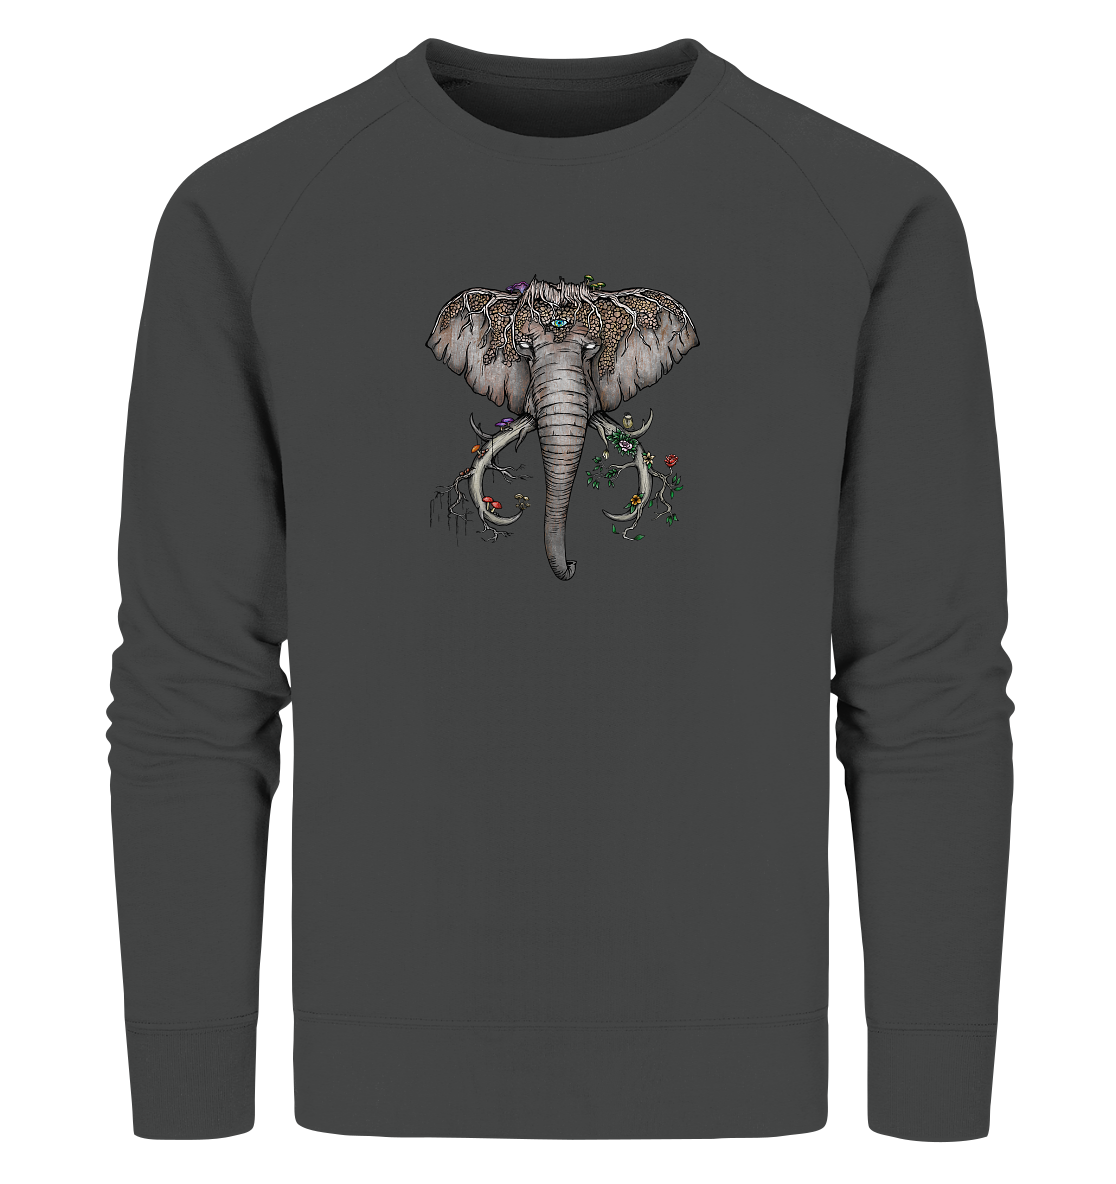 front-organic-sweatshirt-444545-1116x-2.png